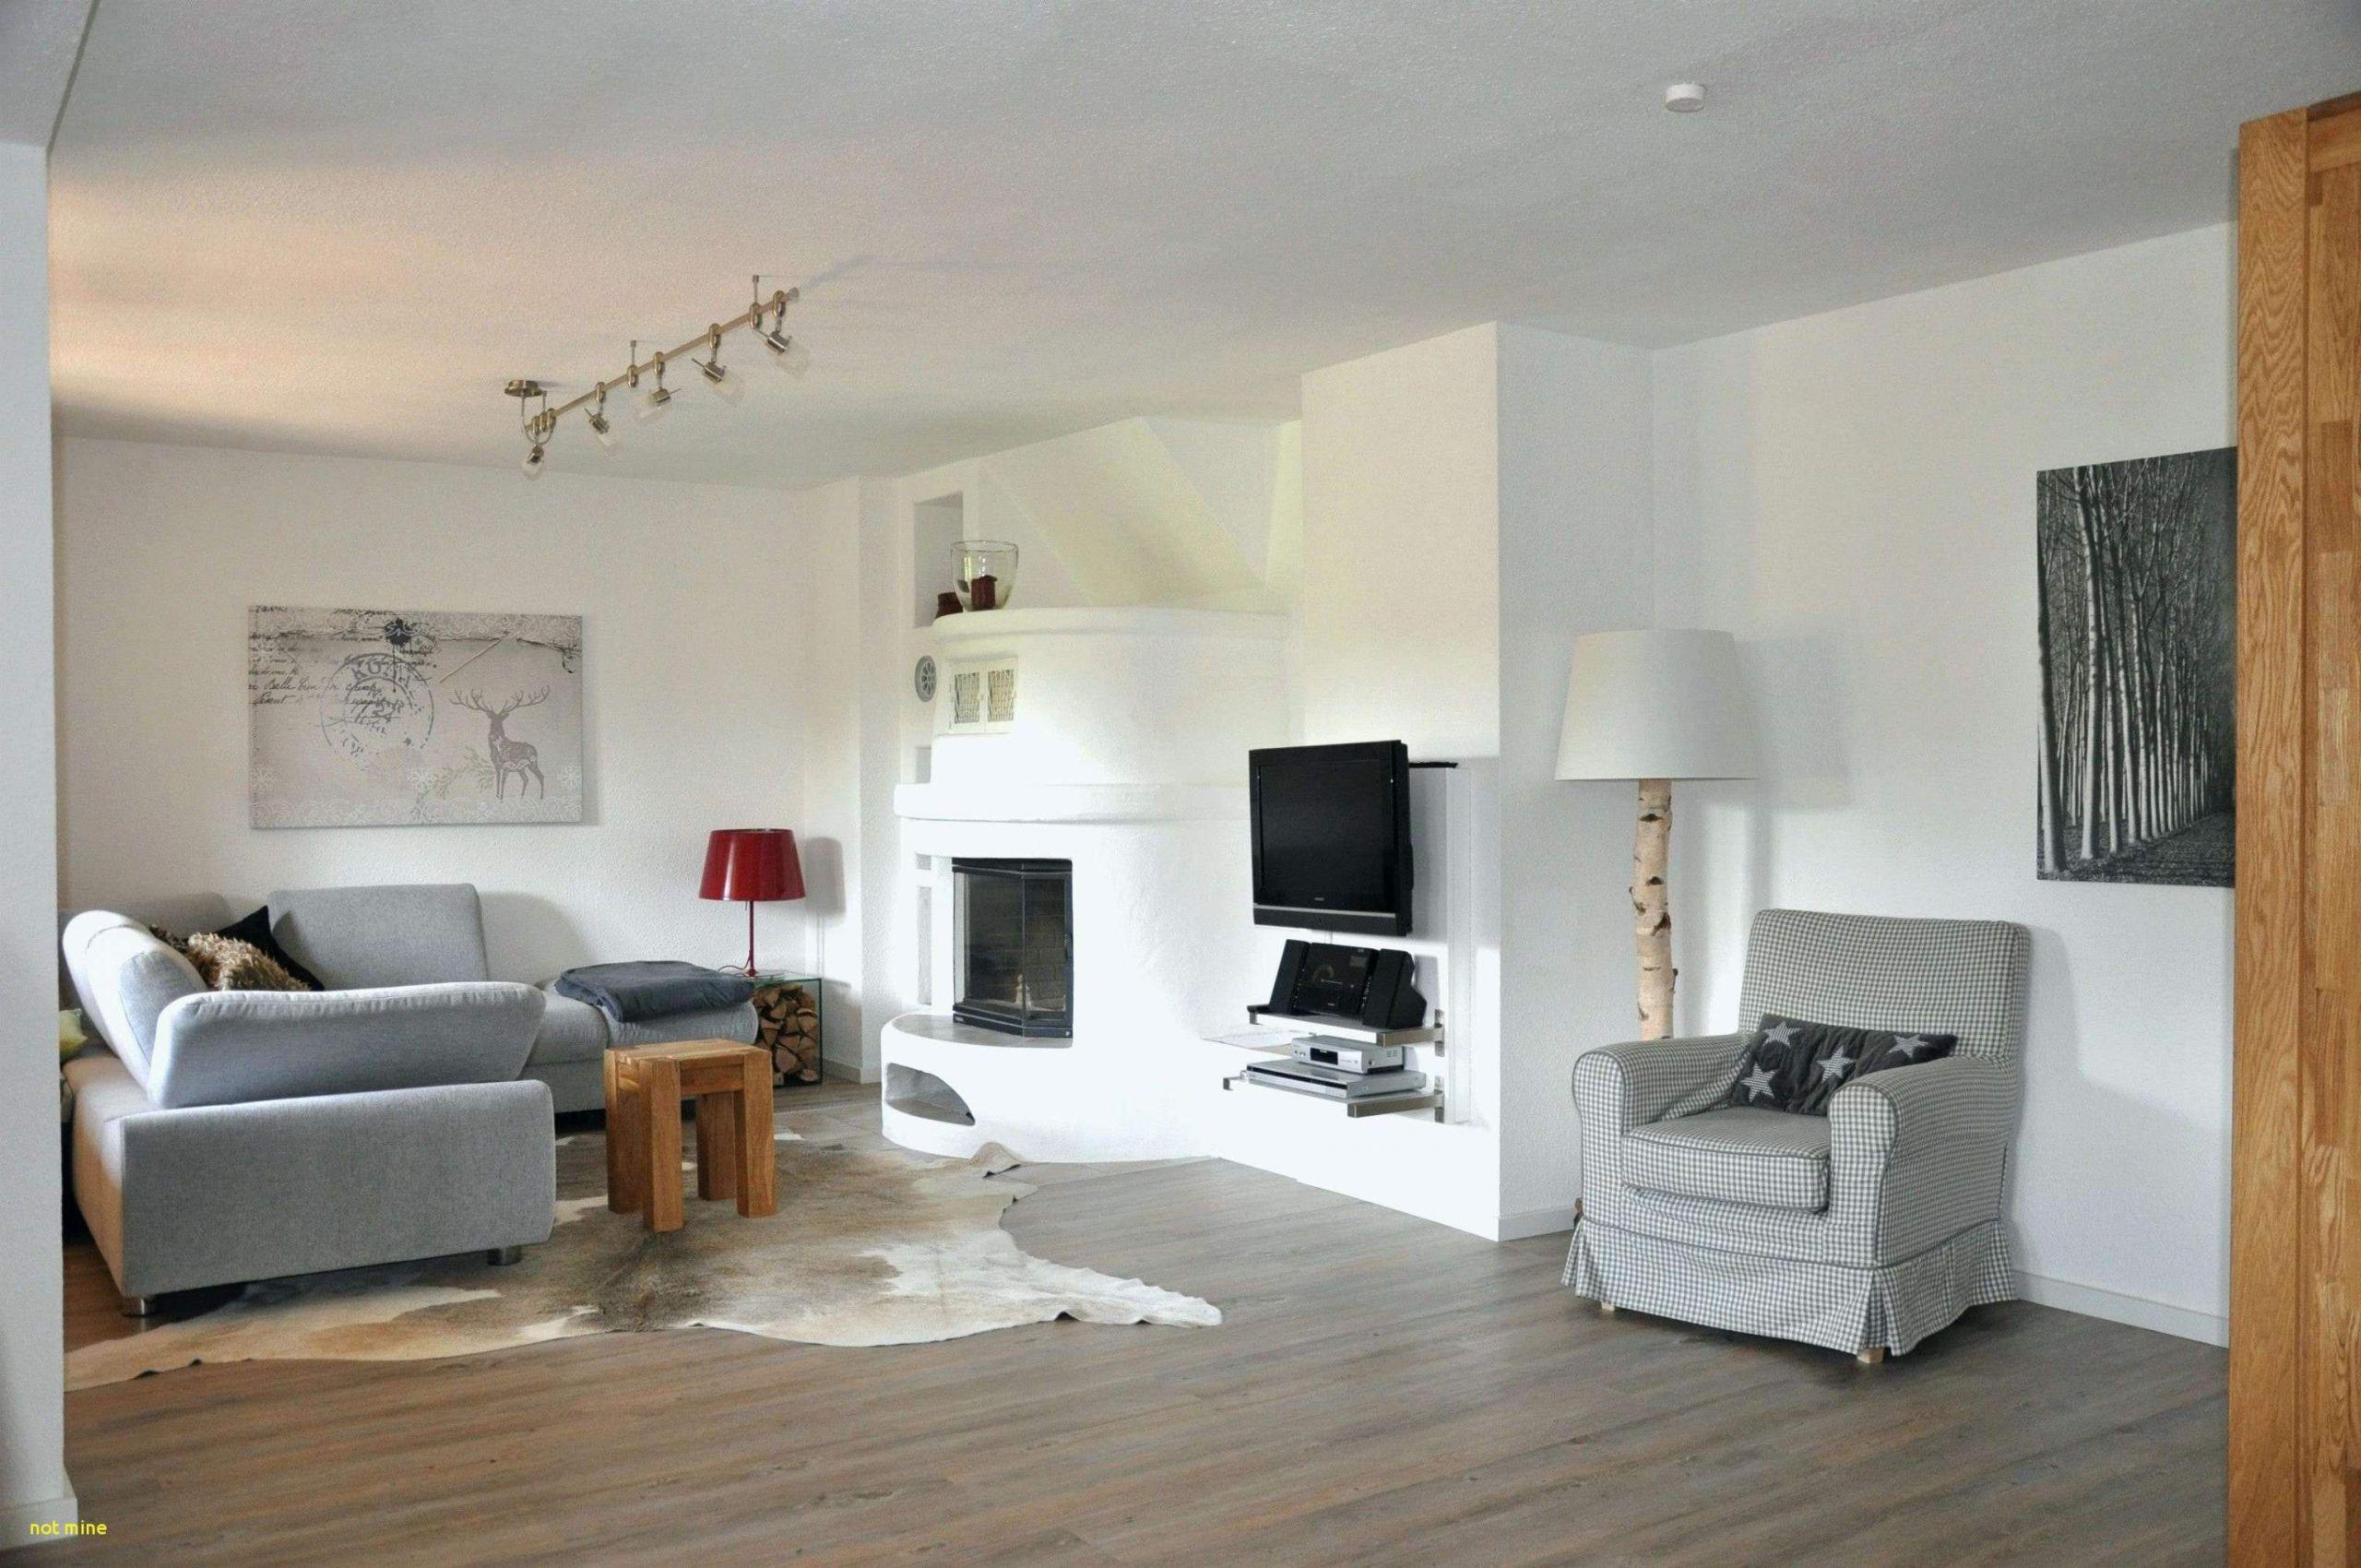 dekorationsideen genial baum wohnzimmer luxus deko ideen